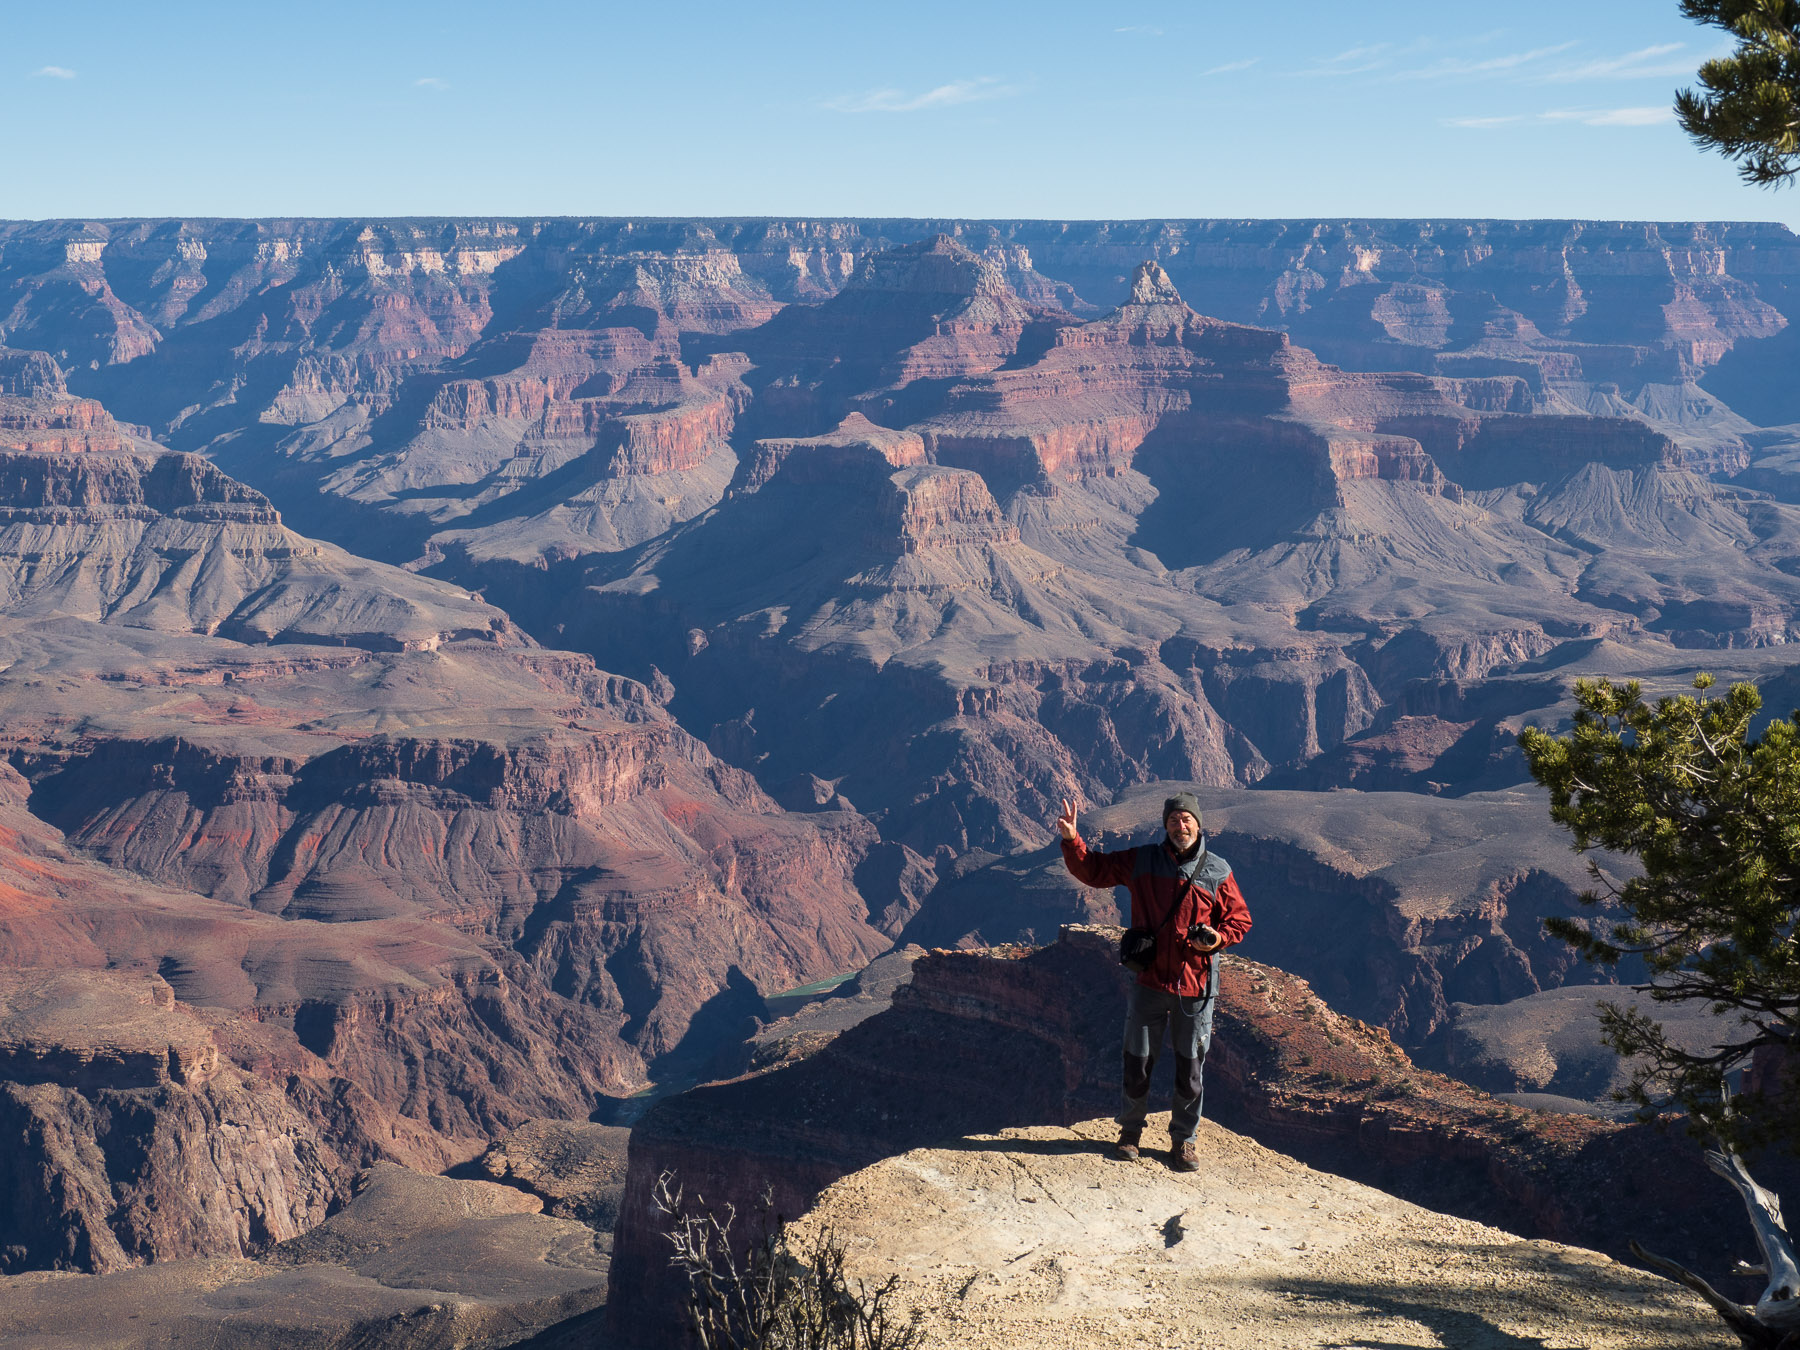 Groß, größer, Grand Canyon